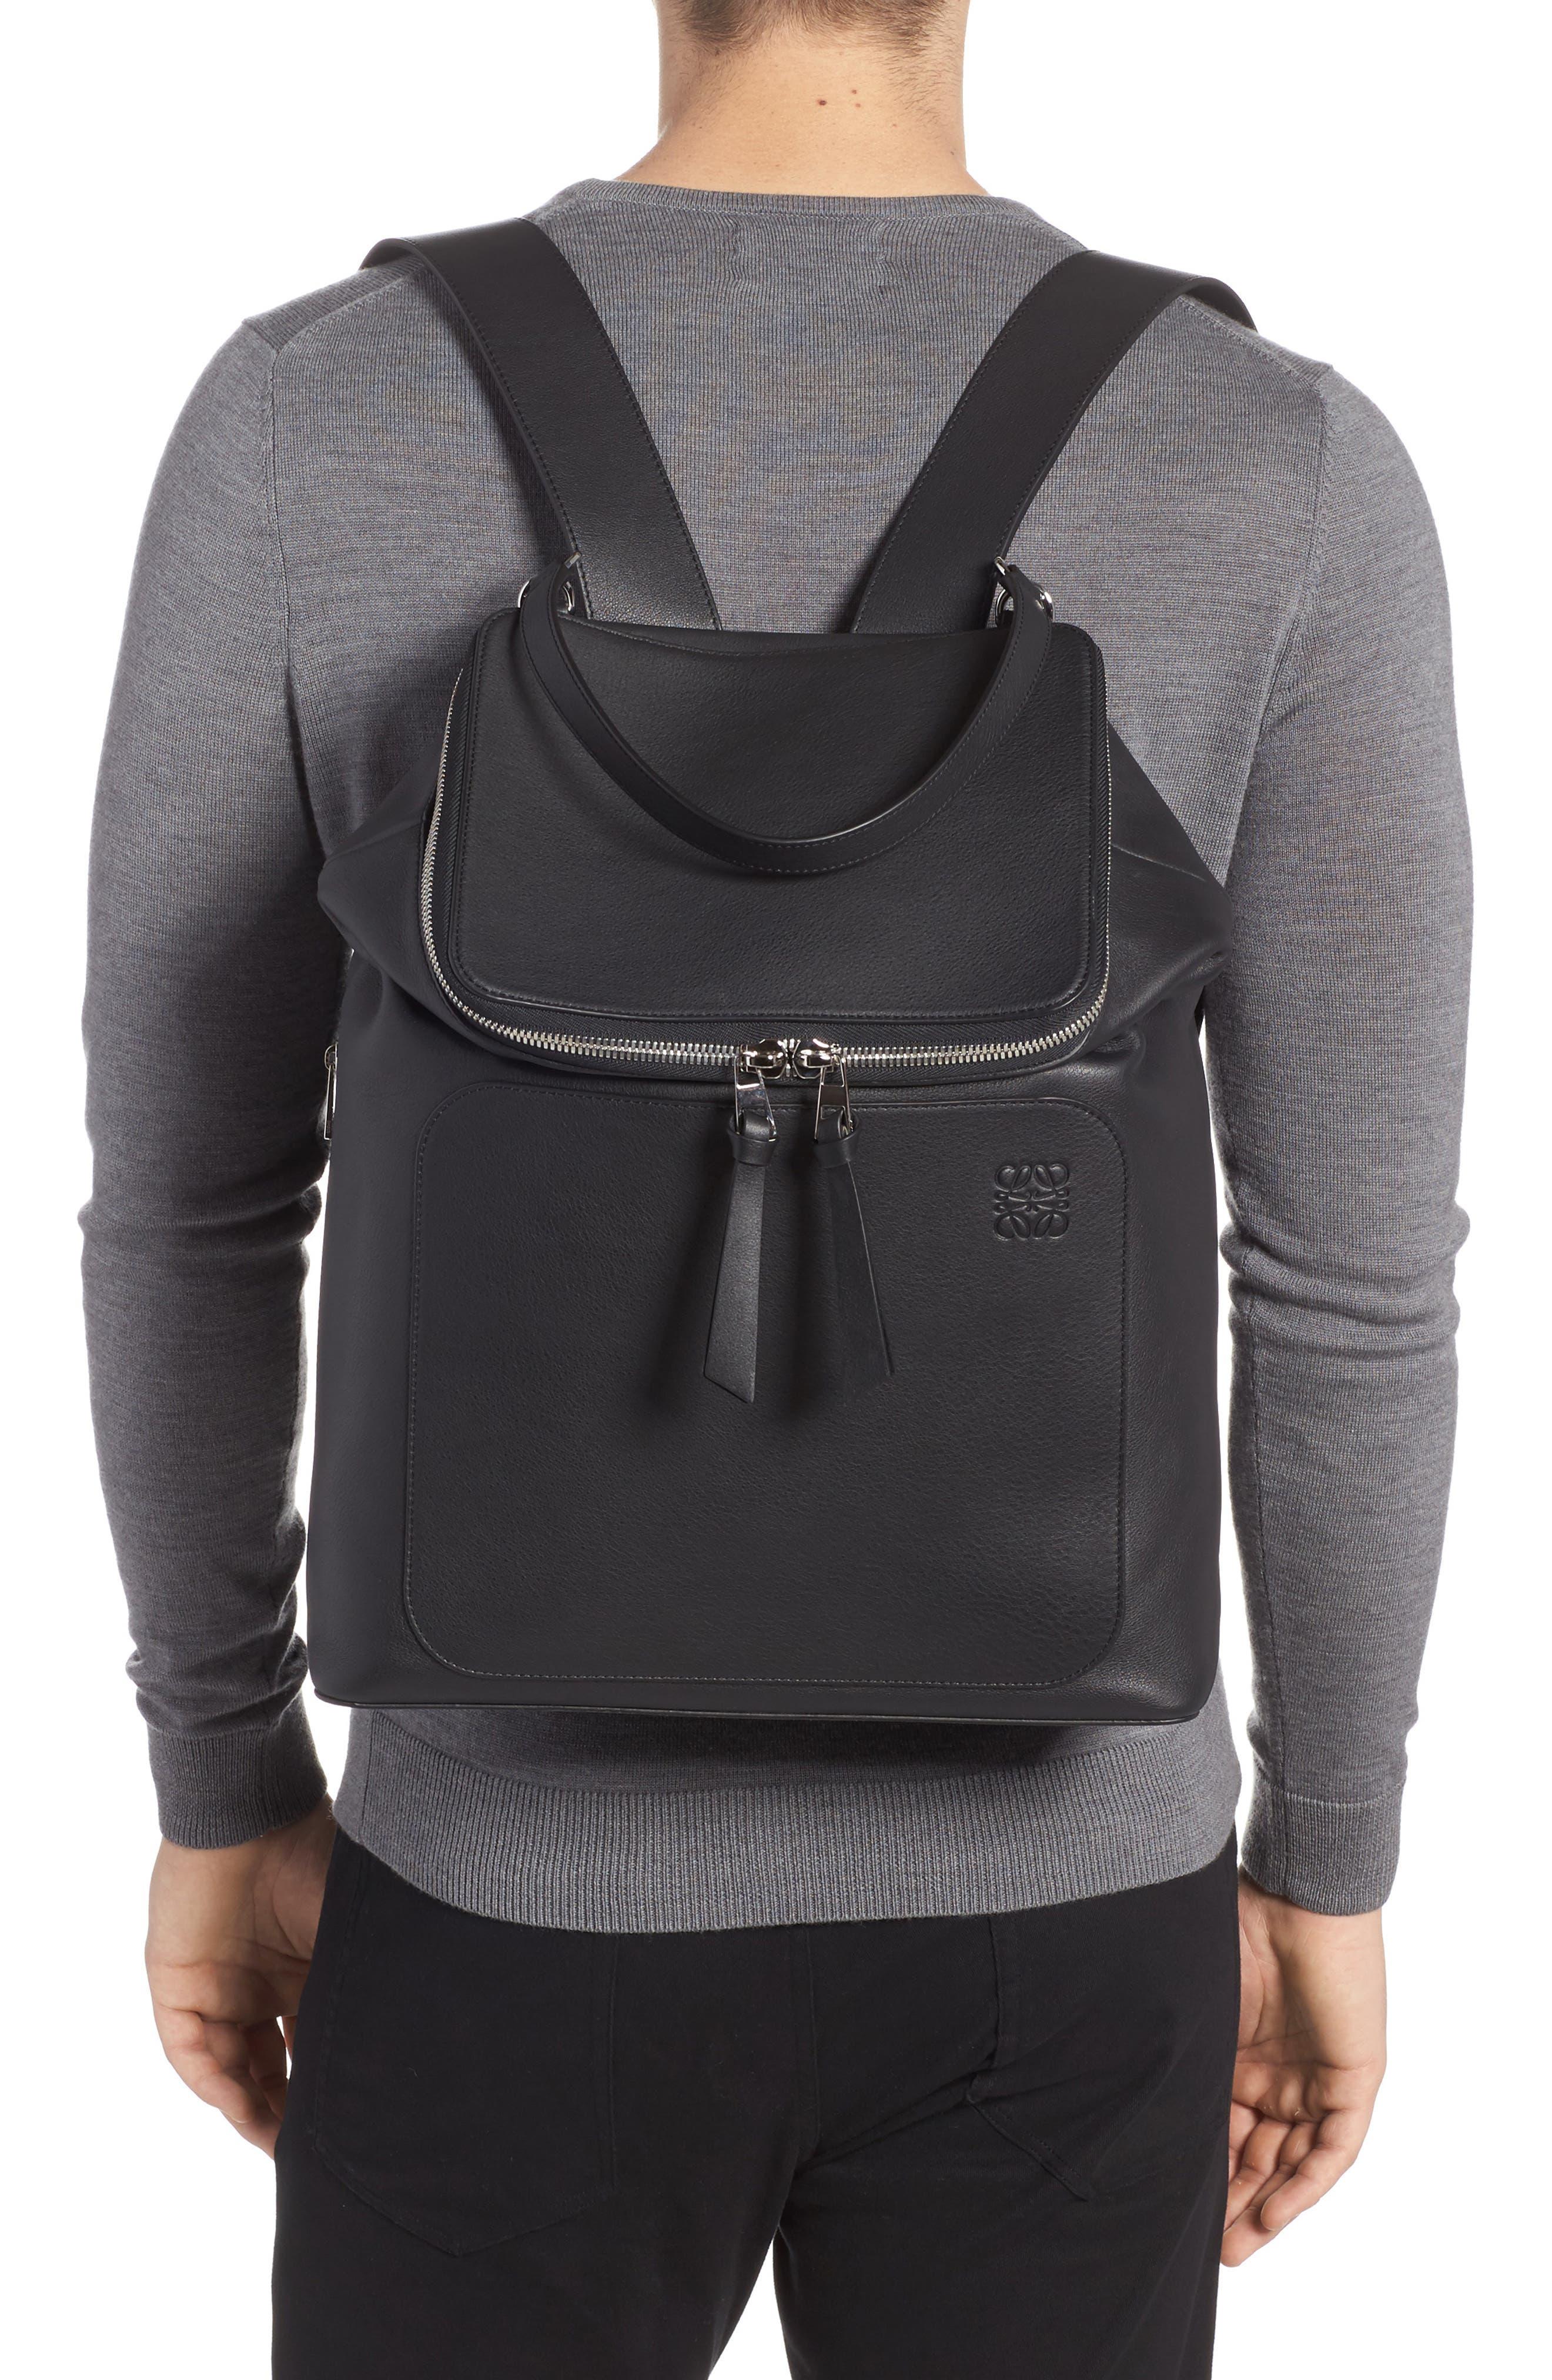 LOEWE, Goya Leather Backpack, Alternate thumbnail 2, color, BLACK